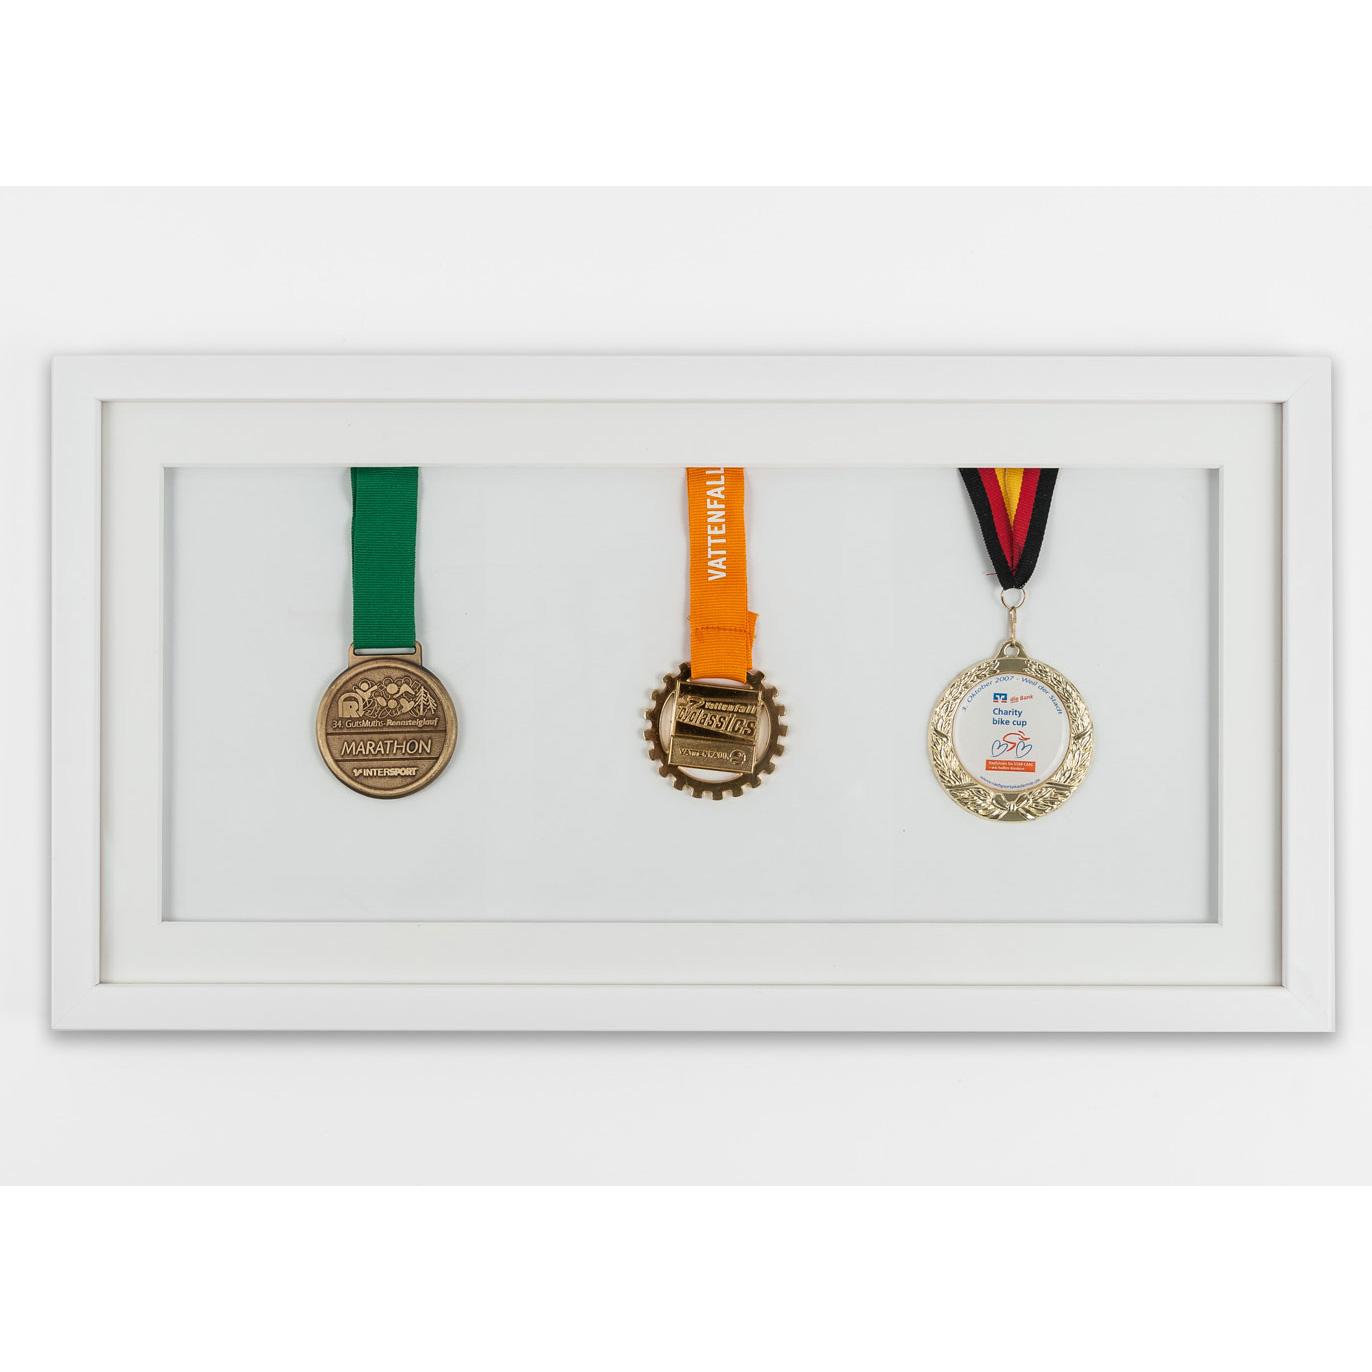 Medaljram 25x50 cm, vit 25x50 cm | vit | standardt glas